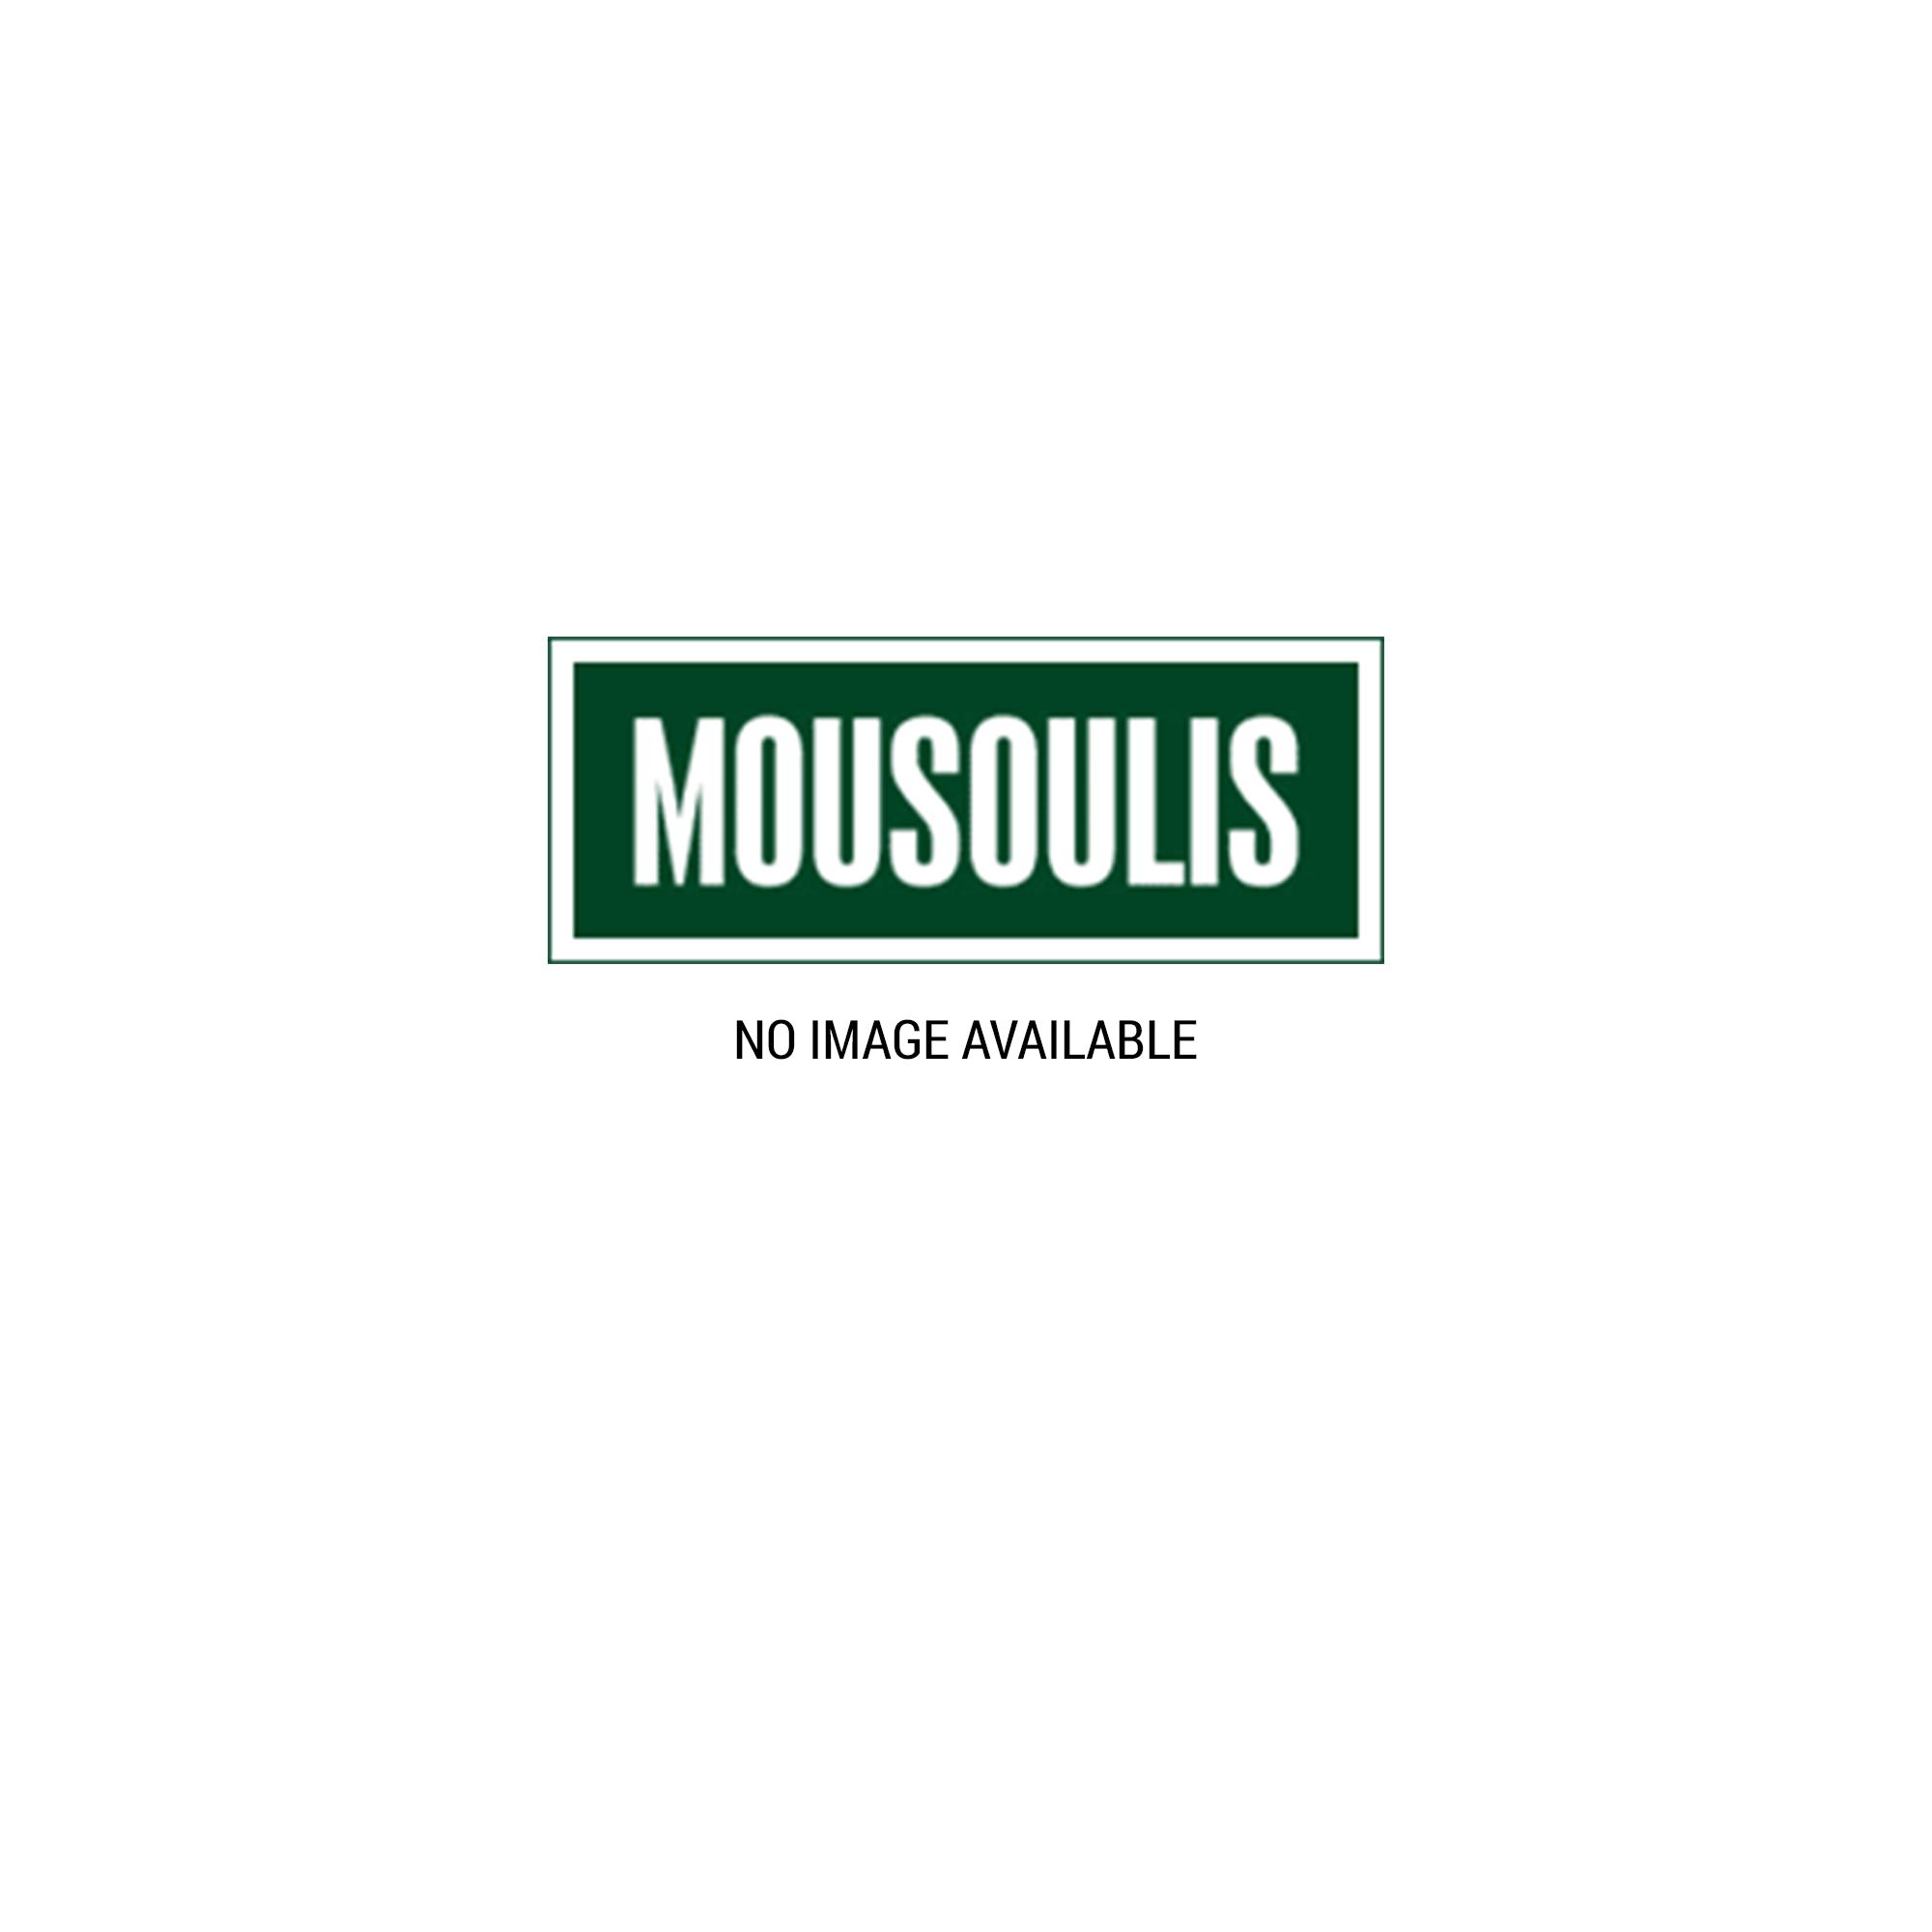 Lacoste Κασκόλ Μάλλινο Μονόχρωμο με Κρόσια RE3140 Μωβ